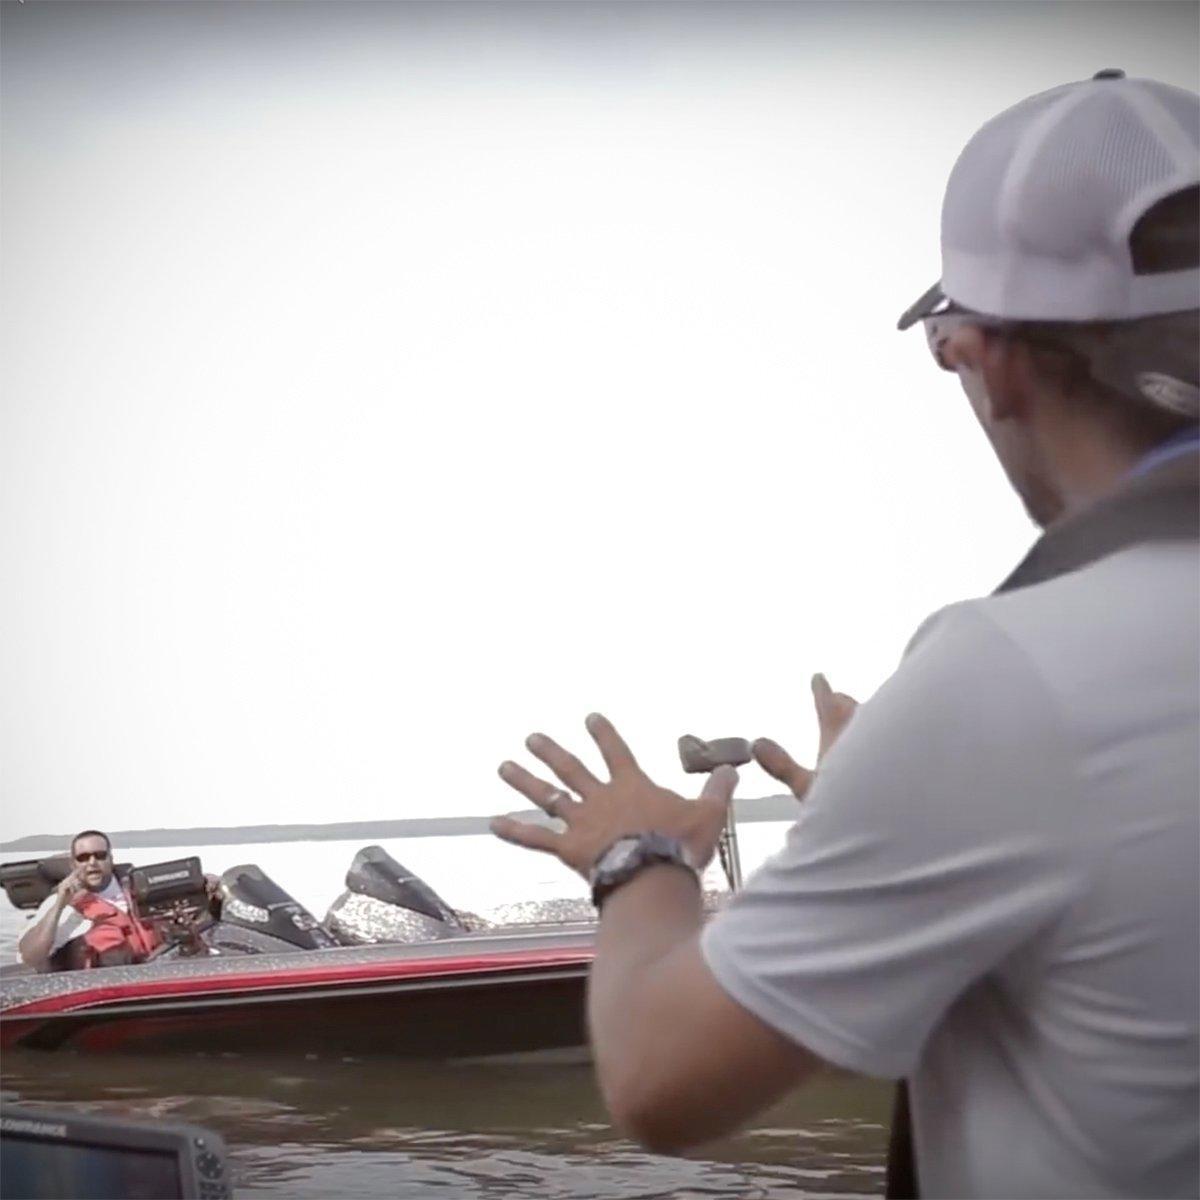 Ike Shares Argument over Fishing Etiquette